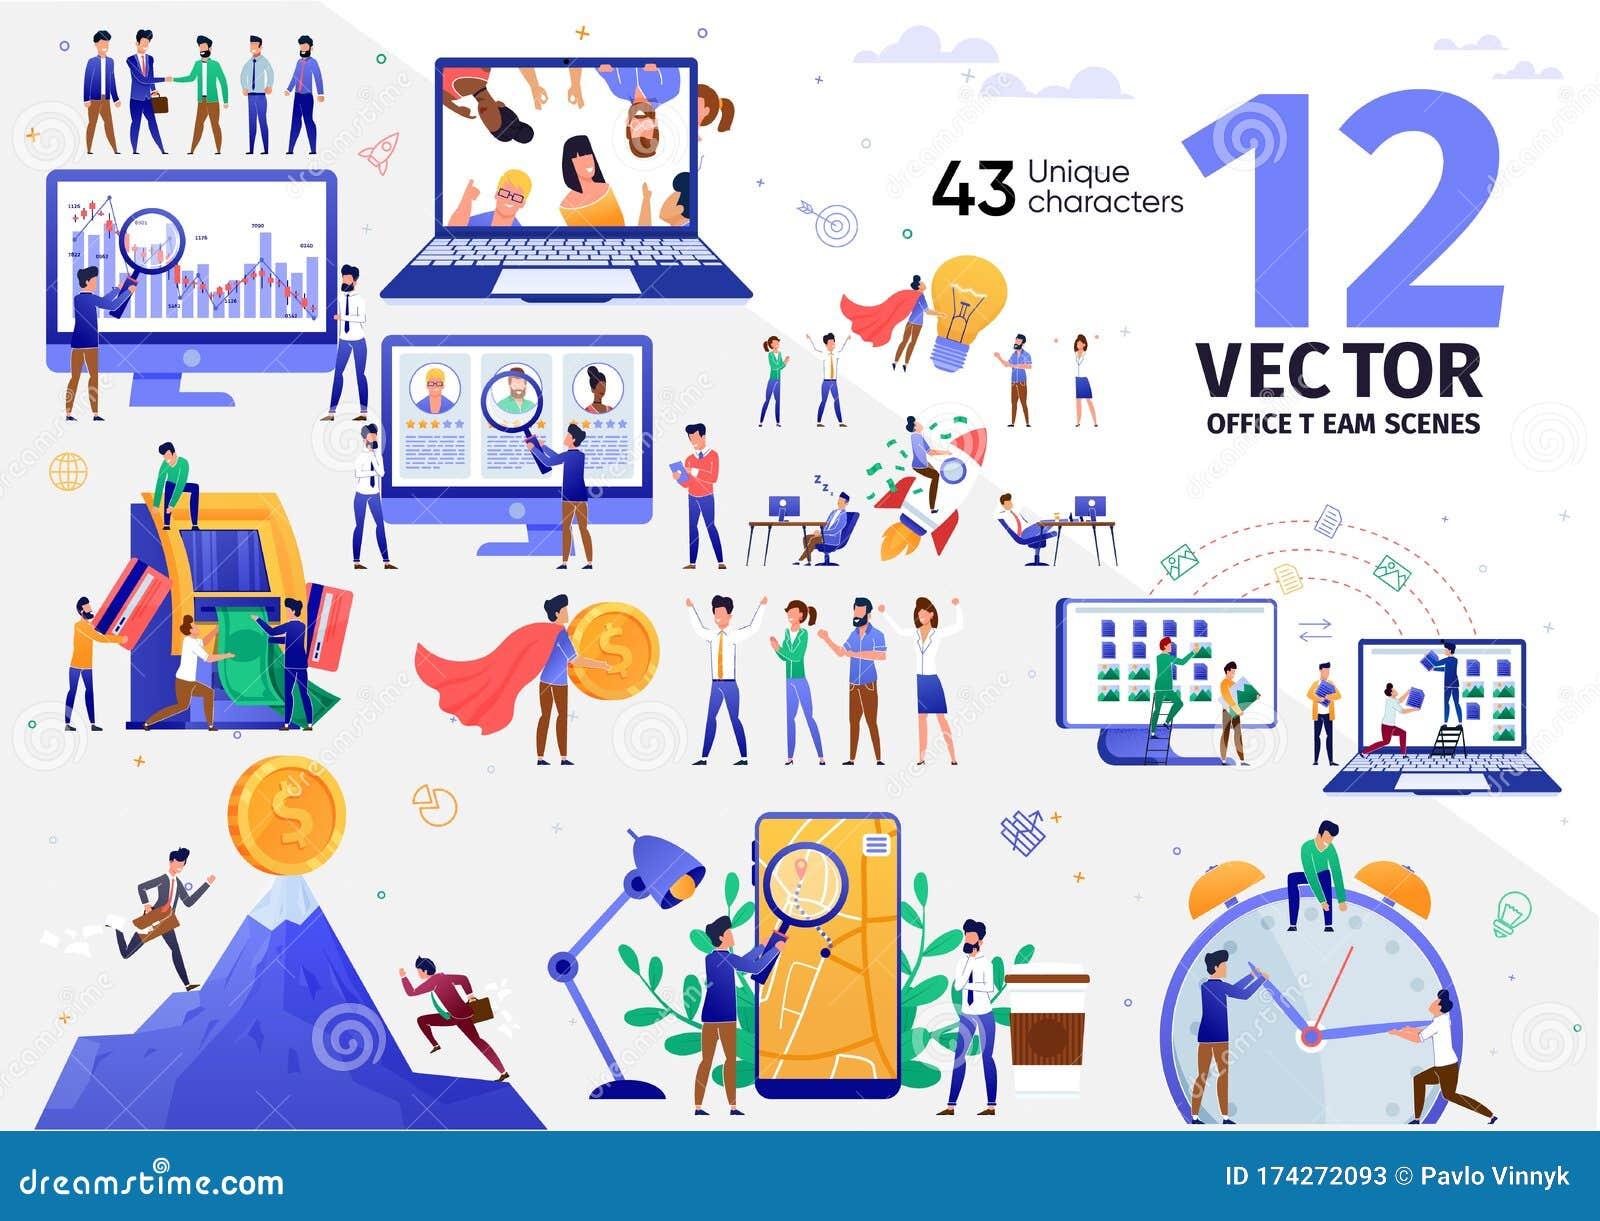 Digital Marketing Business Team Vector Scenes Set Stock Vector Illustration Of Concept Company 174272093